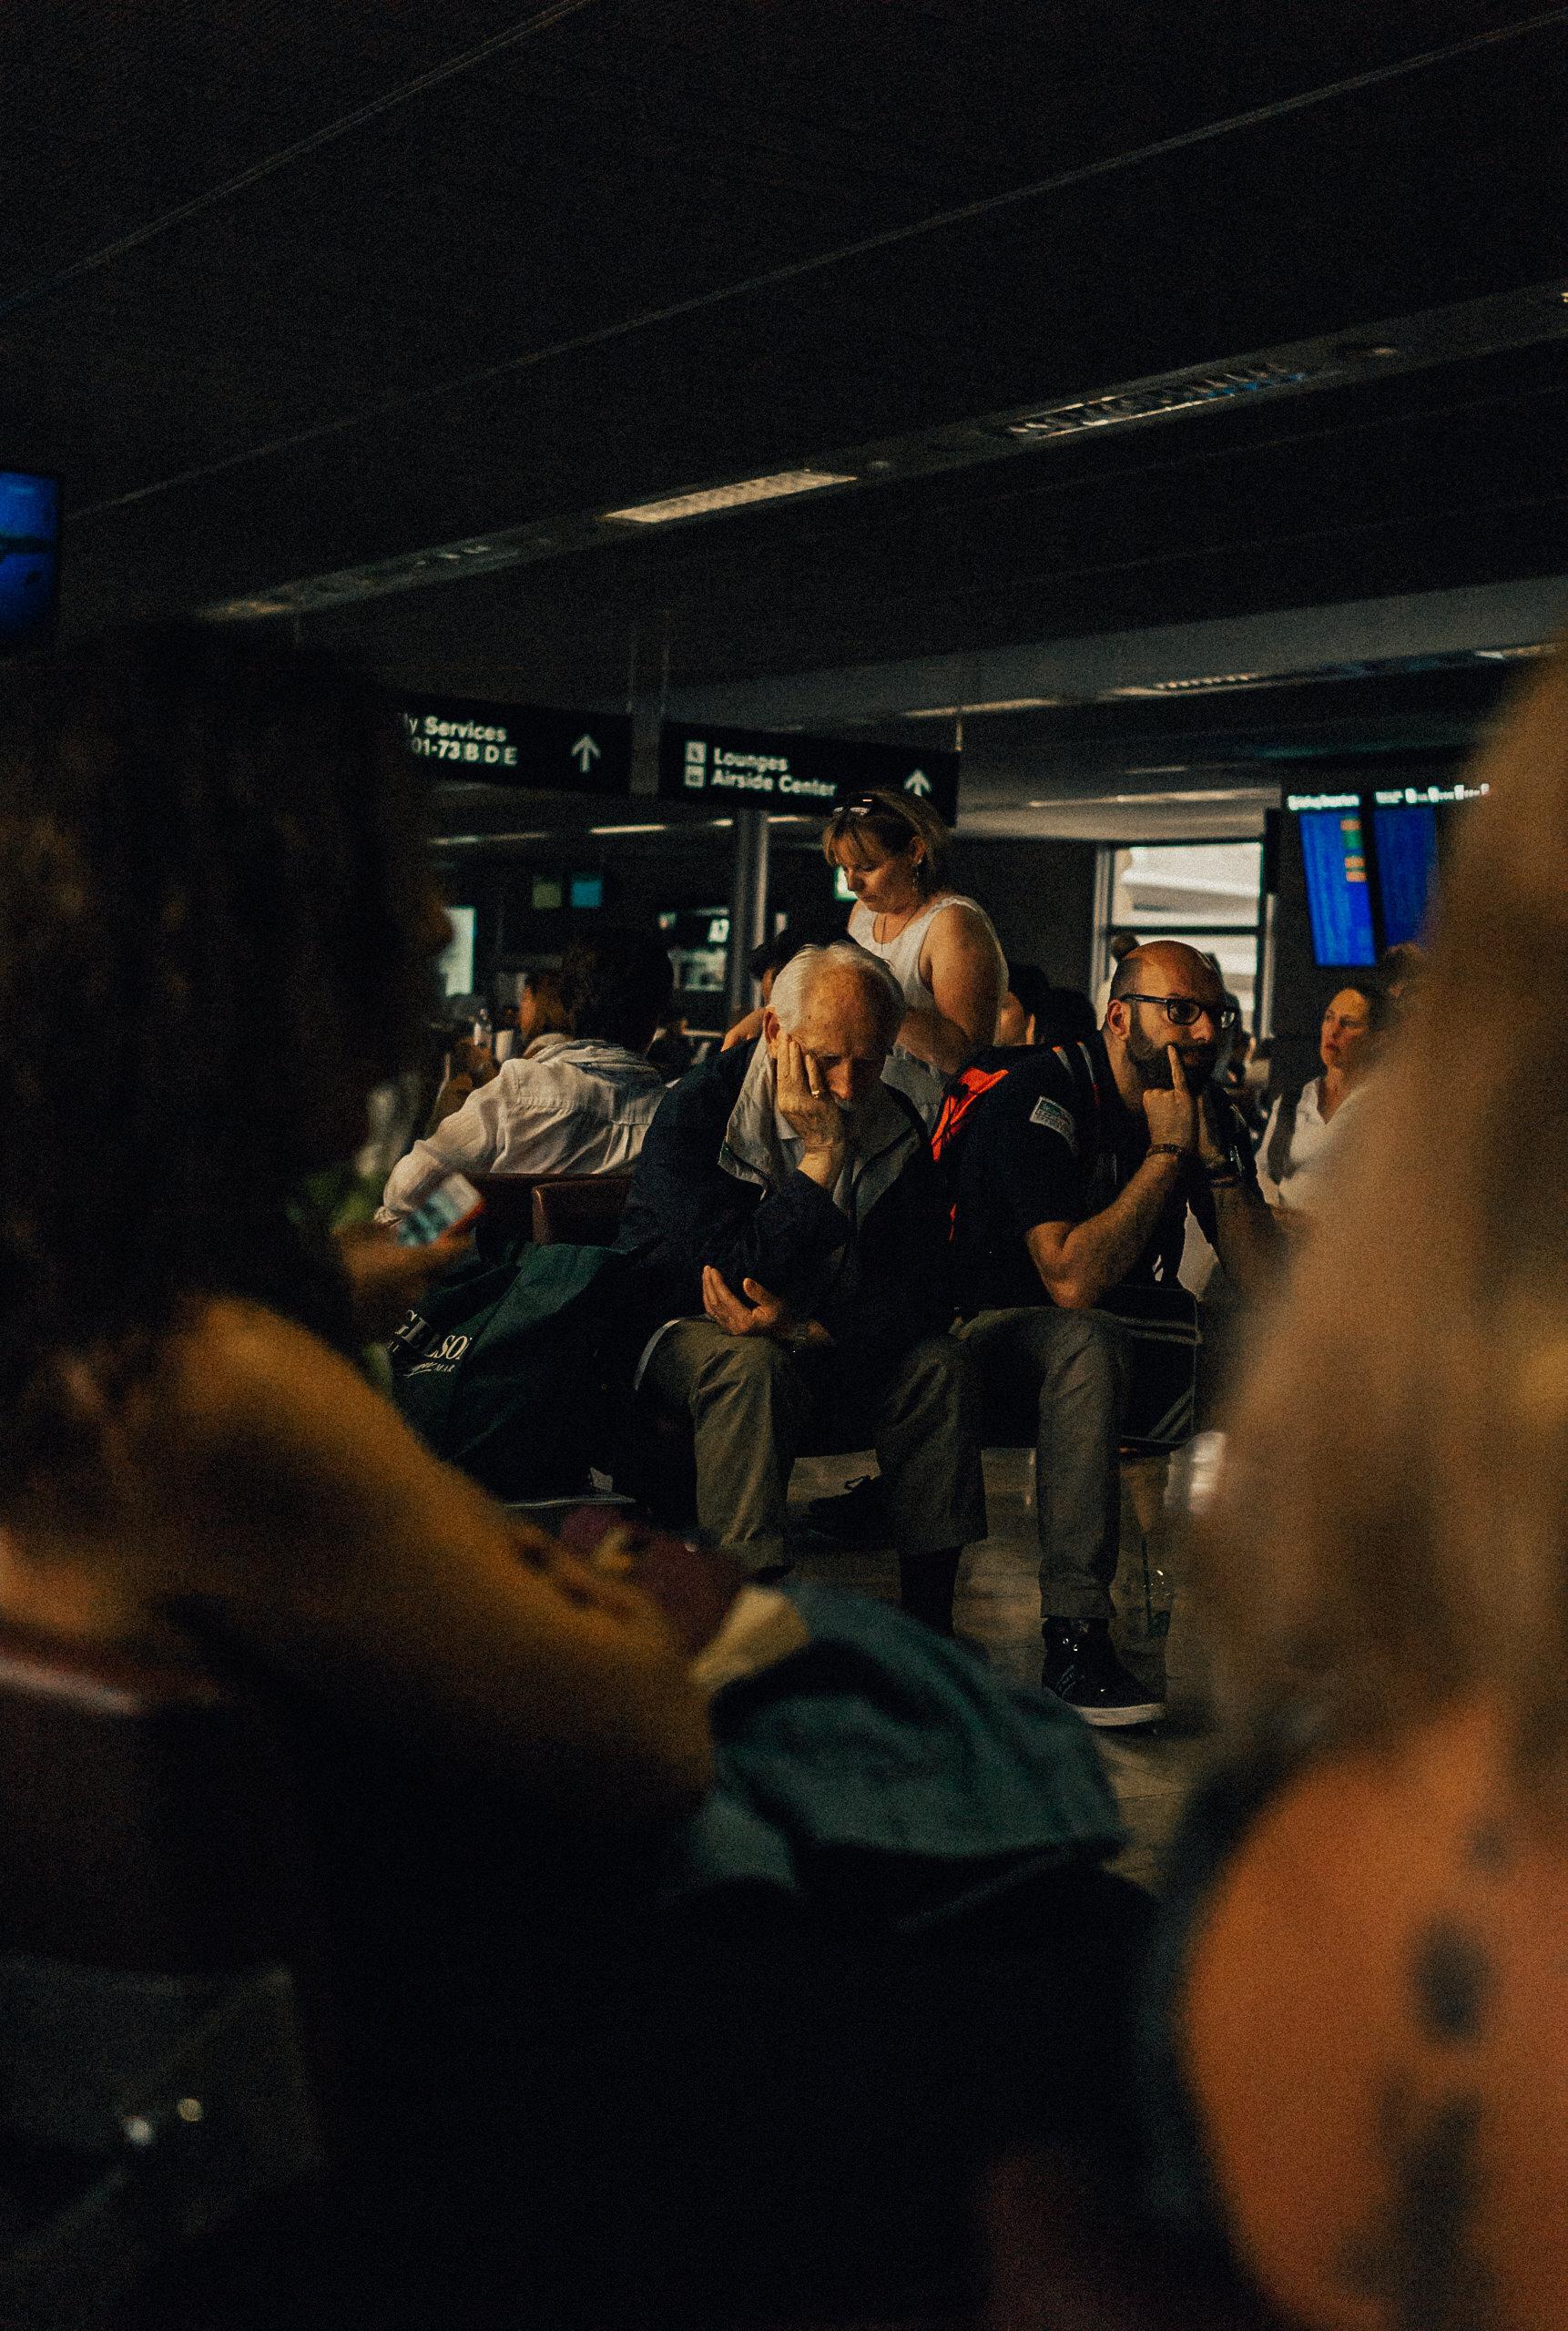 italy_travel_photography02.jpg